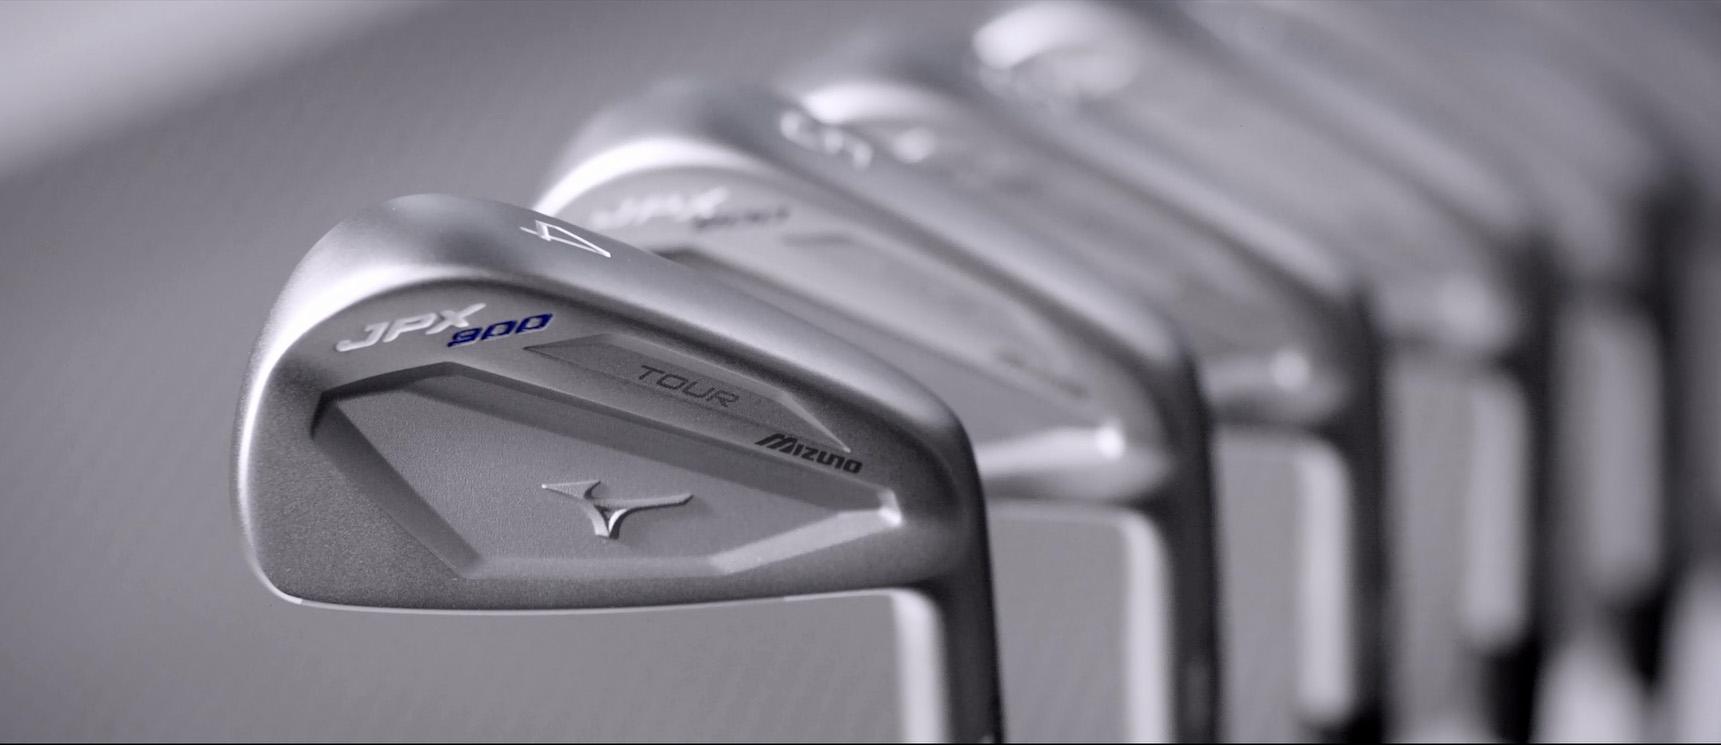 1416c3d0c47 More information on the new Mizuno JPX900 irons - Mizuno Golf Europe